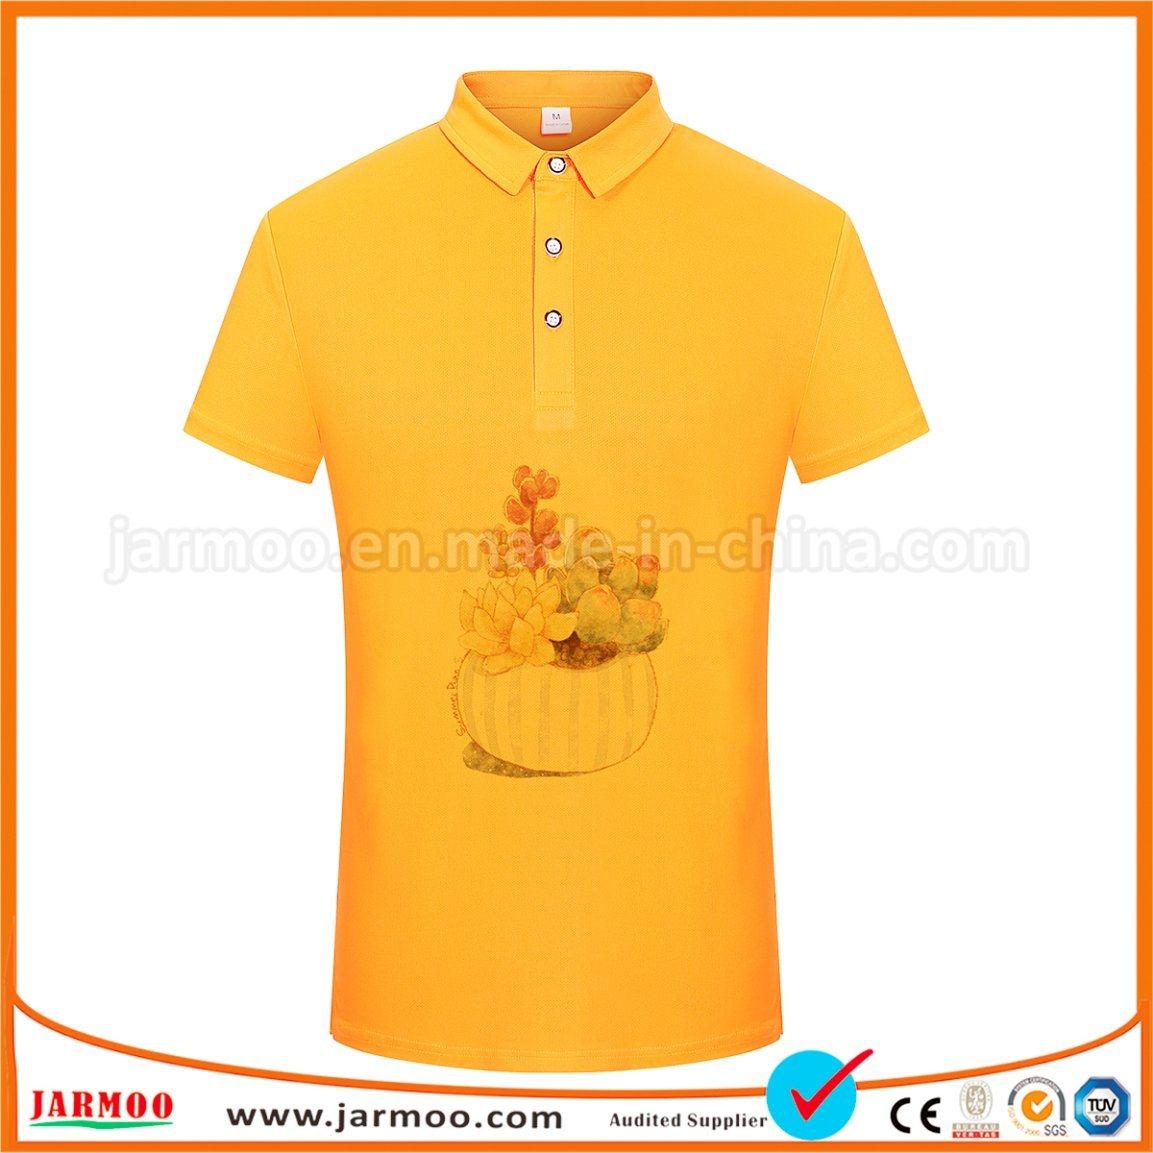 b27878f3a China Free Design Printing Custom Polo Shirts - China Polo T Shirt, Cotton  T Shirt